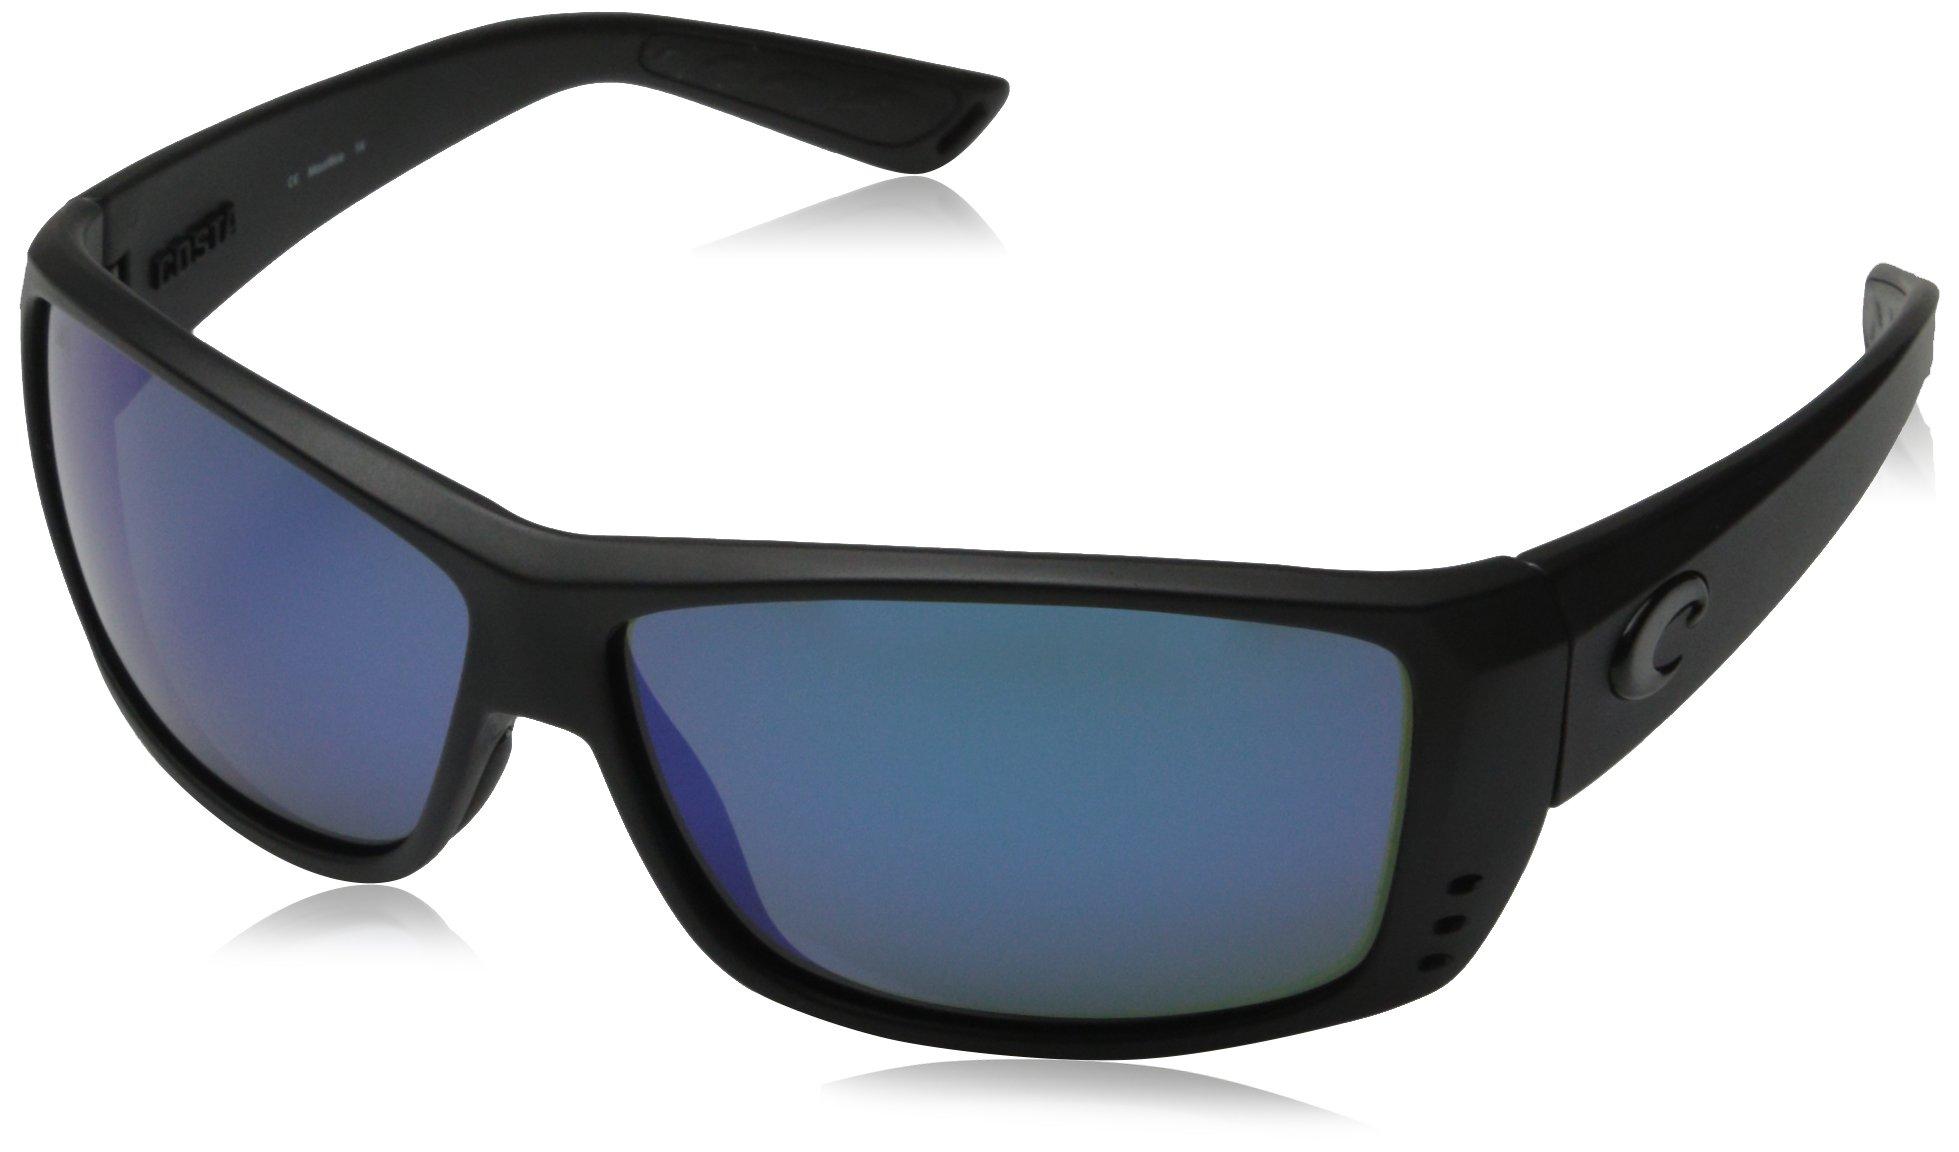 Costa del Mar Unisex-Adult Cat Cay AT 01 OBMGLP Polarized Iridium Wrap Sunglasses, Blackout, 60.9 mm by Costa Del Mar